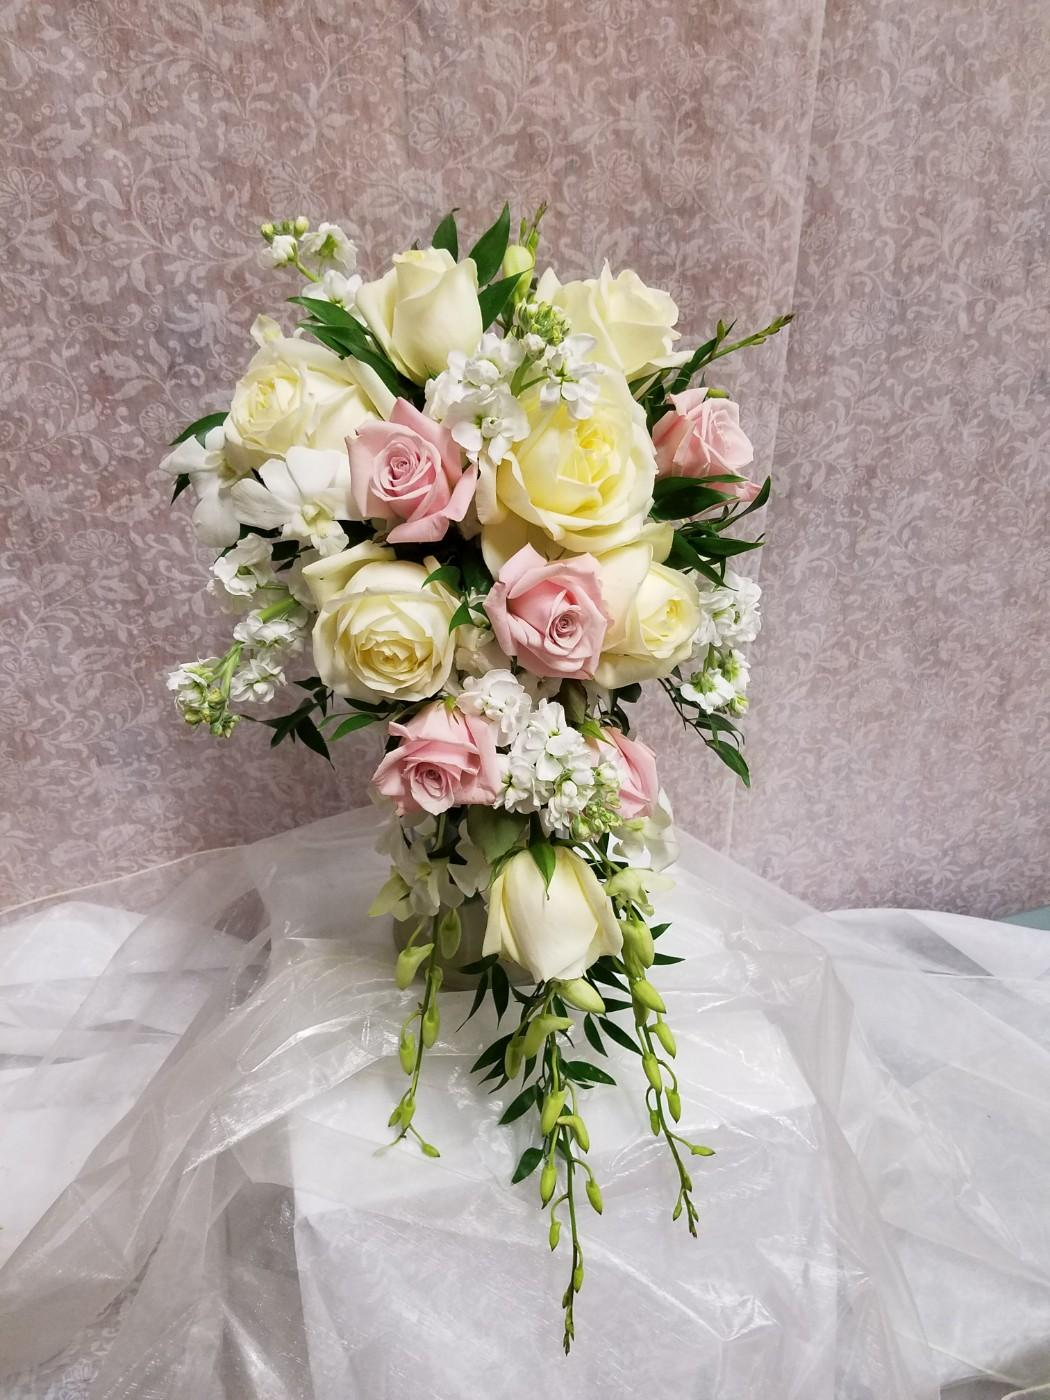 Bridal party delivery southampton pa domenic graziano flowers bridal bouquet izmirmasajfo